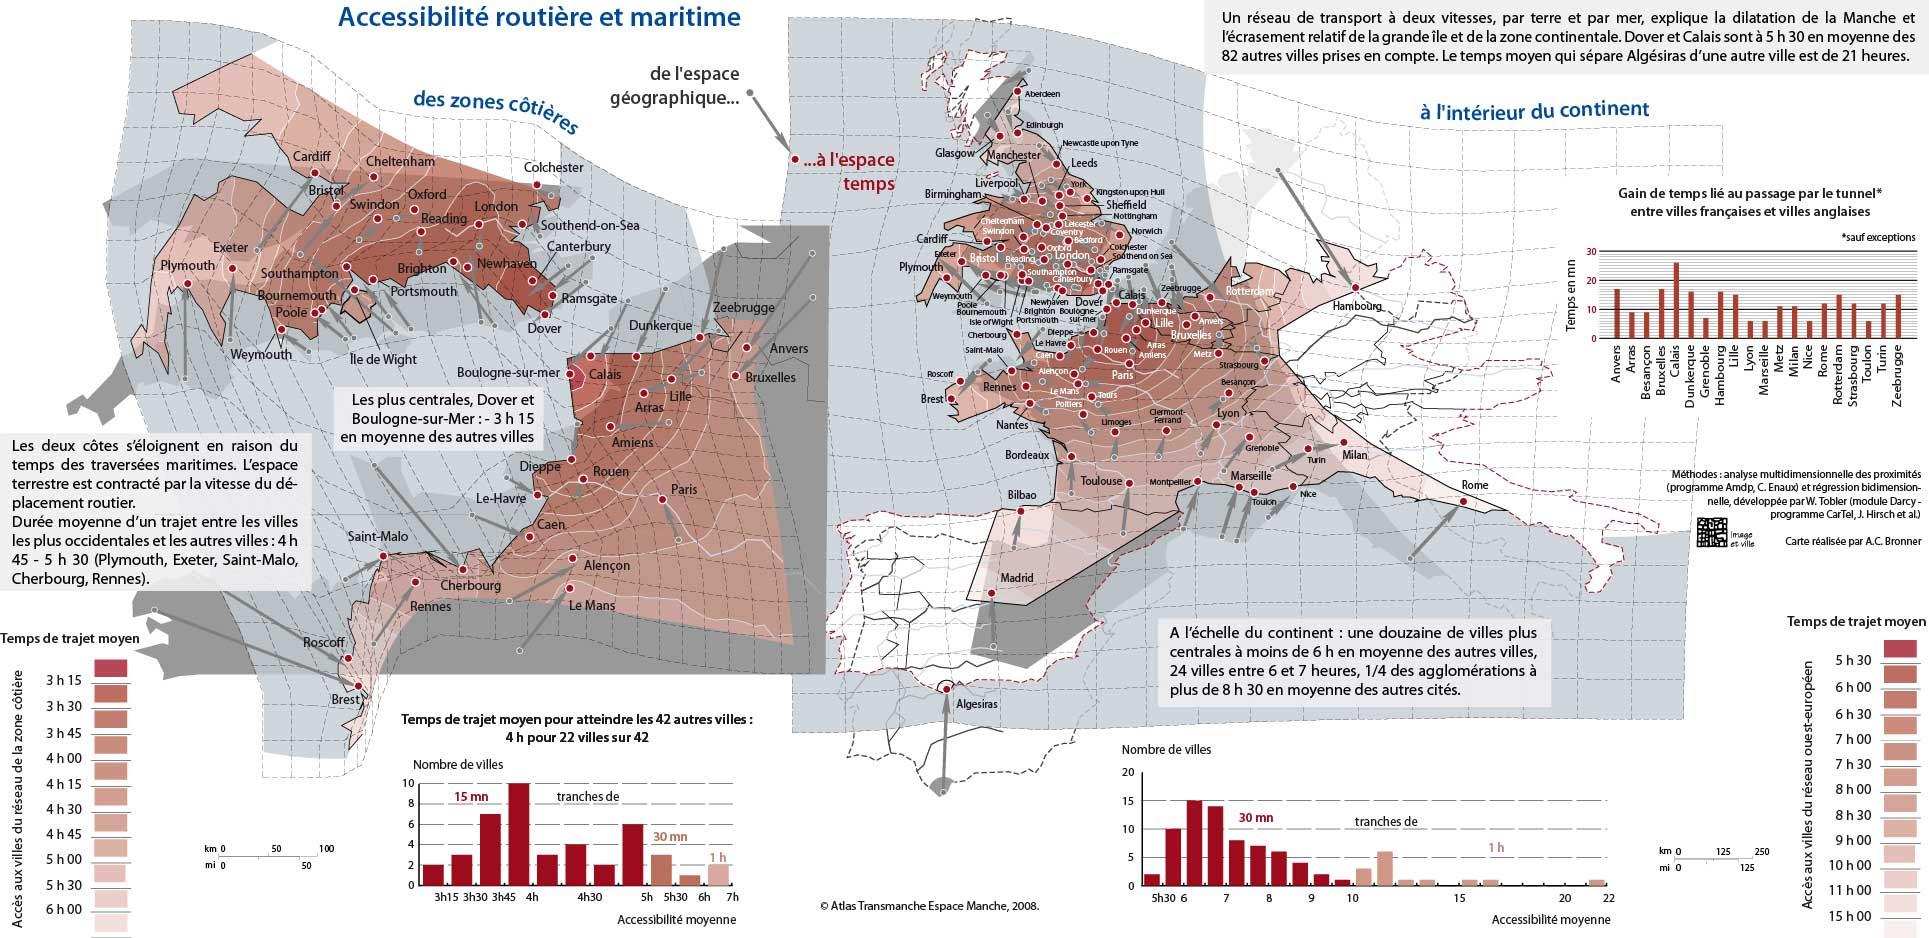 http://atlas-transmanche.certic.unicaen.fr/fr/image-923.jpg